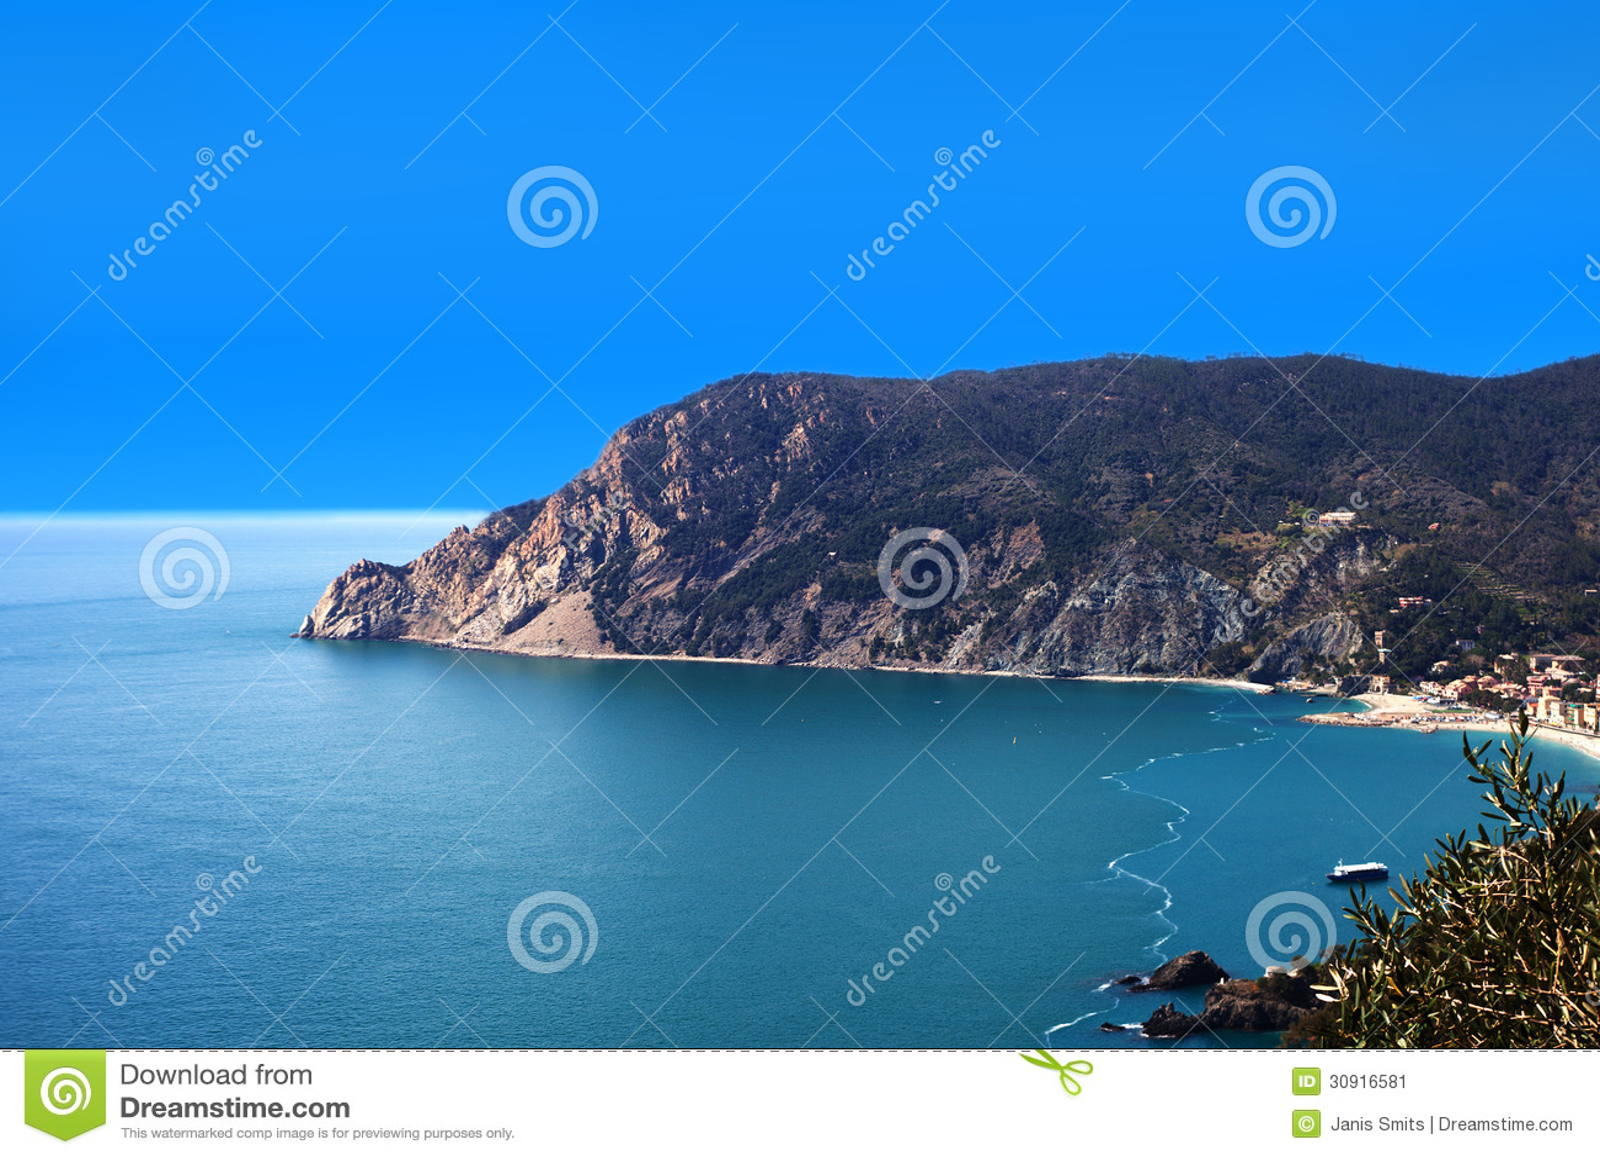 sea monterosso italy - photo #26